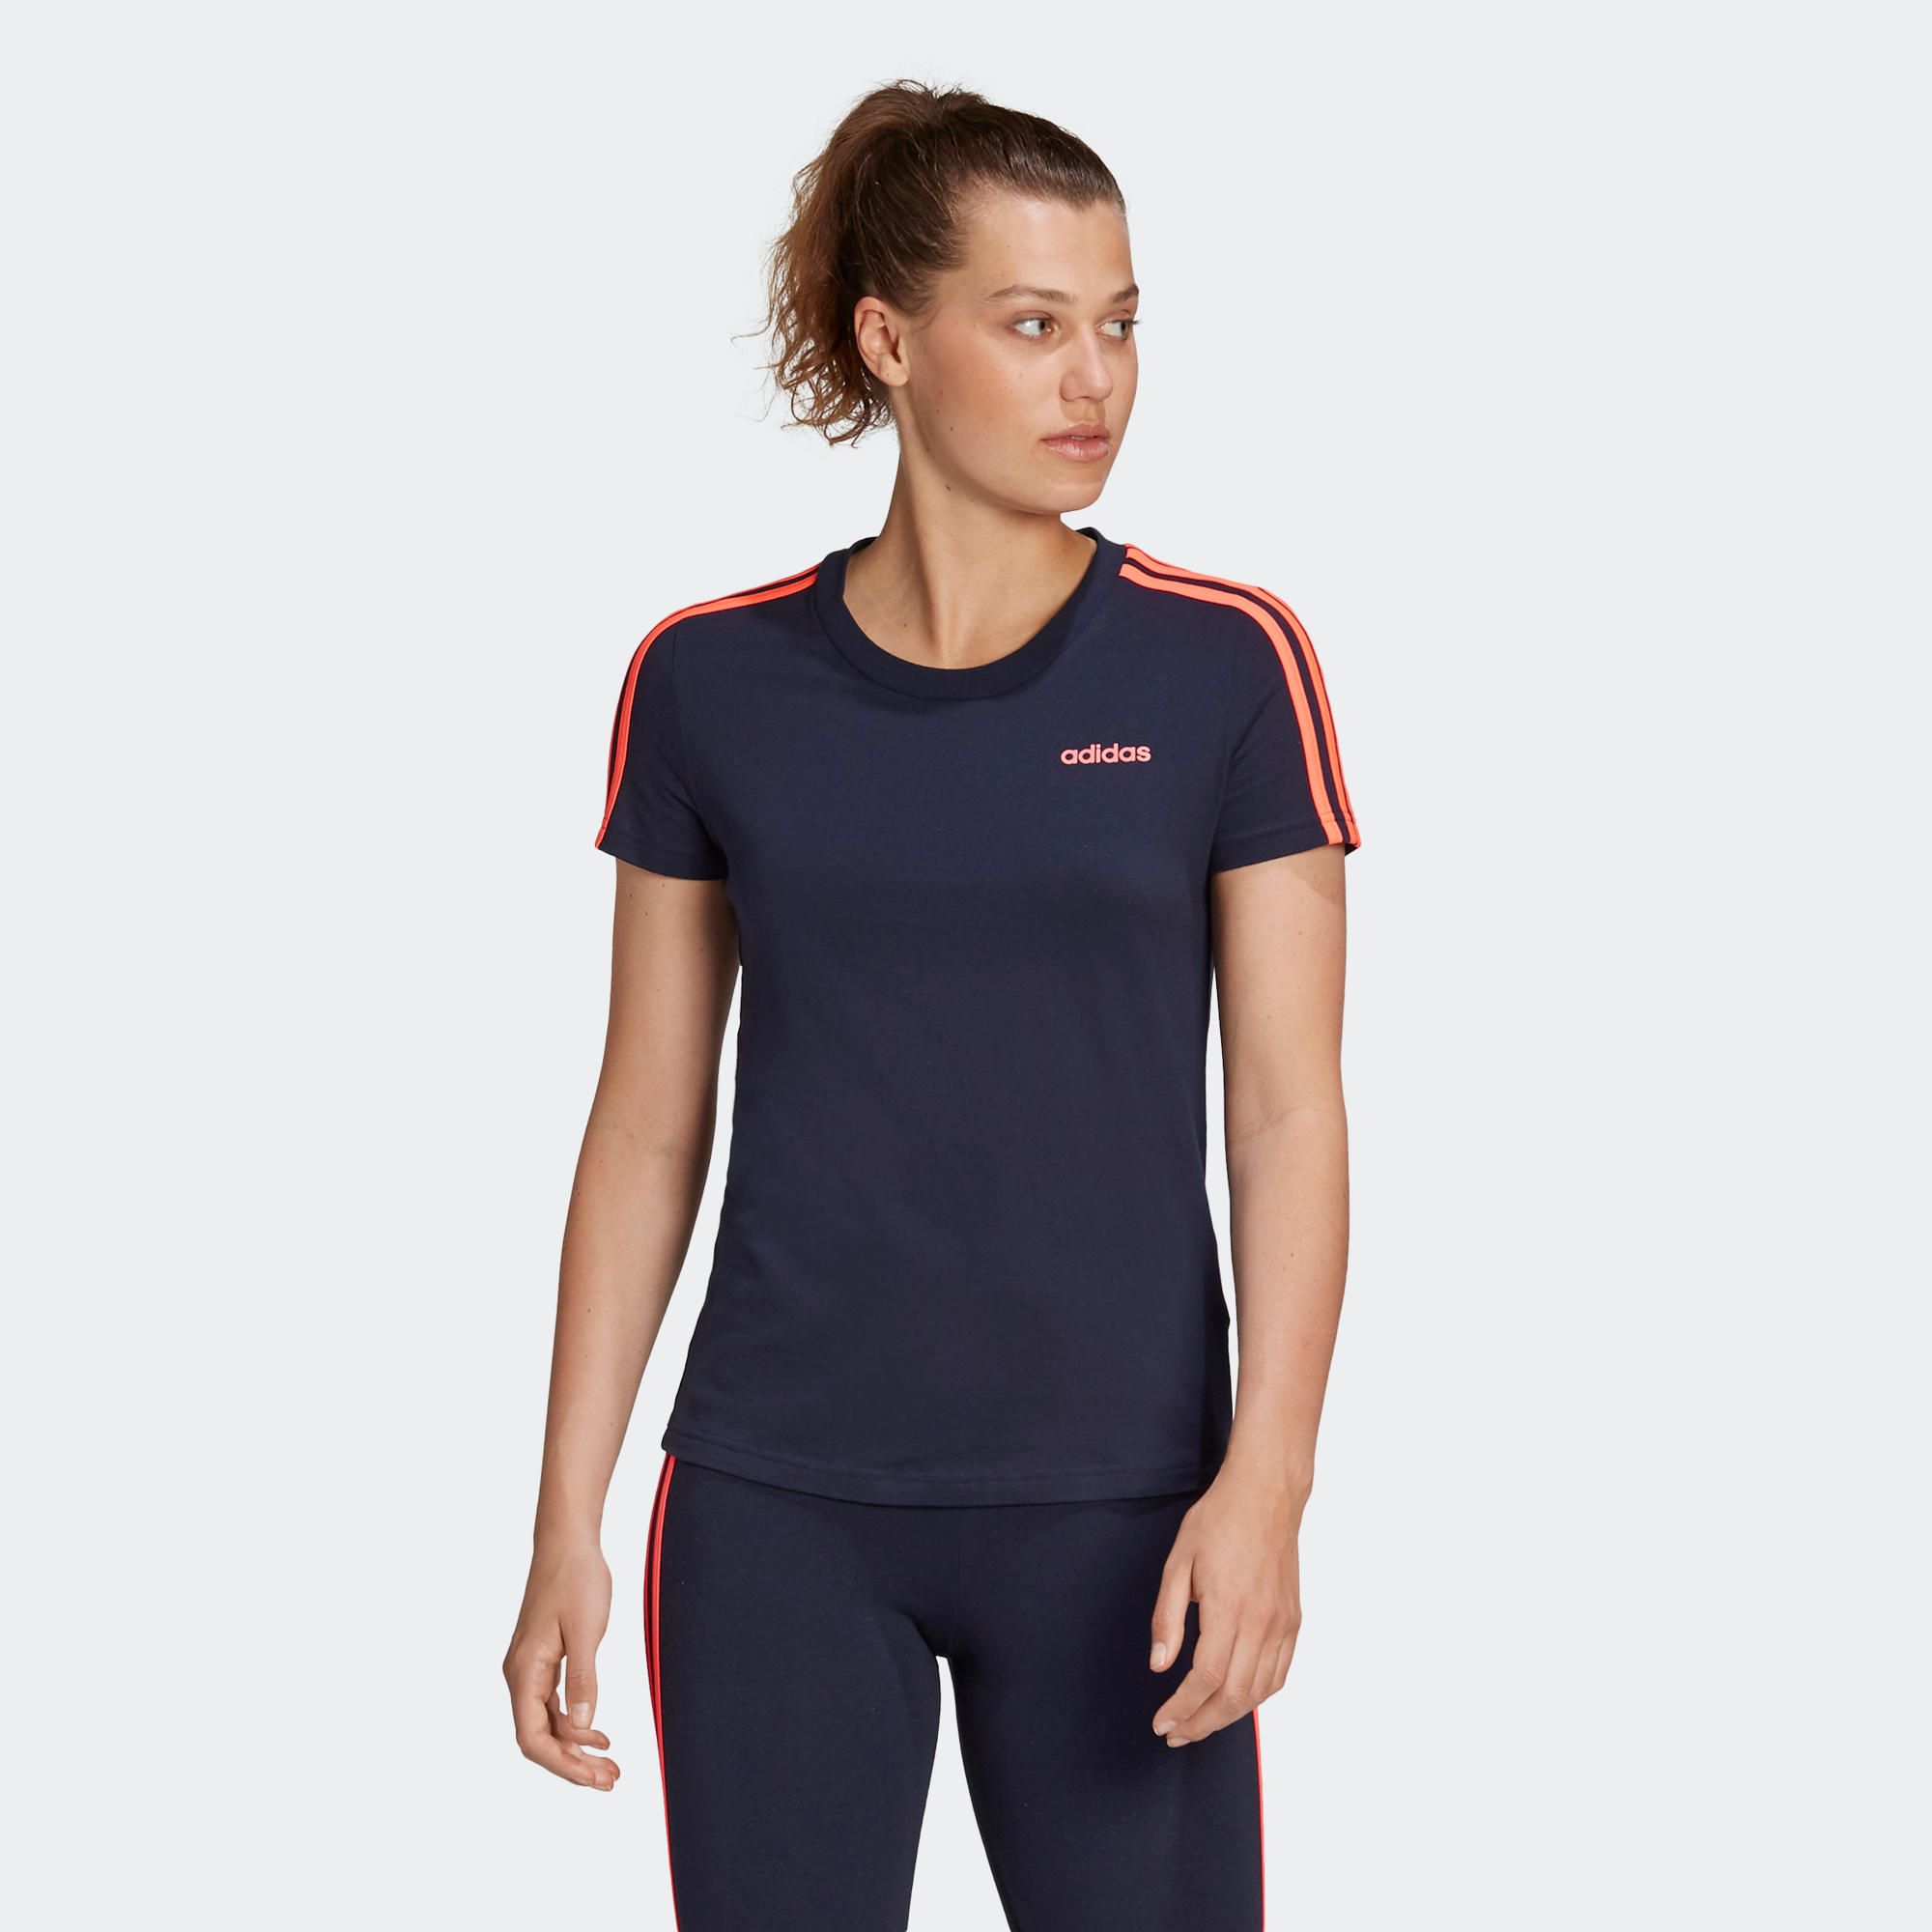 Tricou Adidas bleumarin 3S imagine